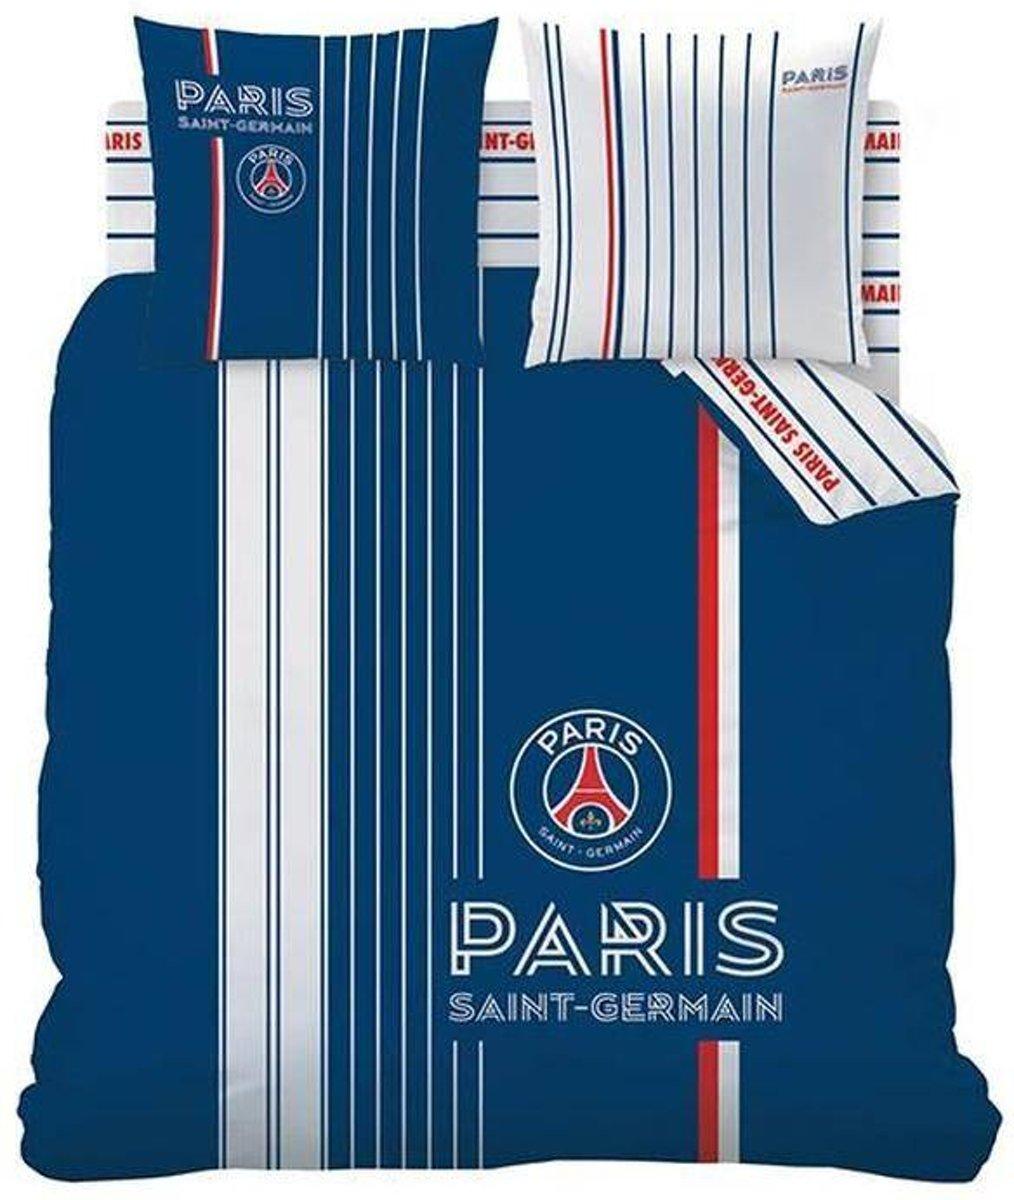 Paris Saint Germain Winner - Dekbedovertrek - Lits Jumeaux - 240 x 220 cm - Blauw